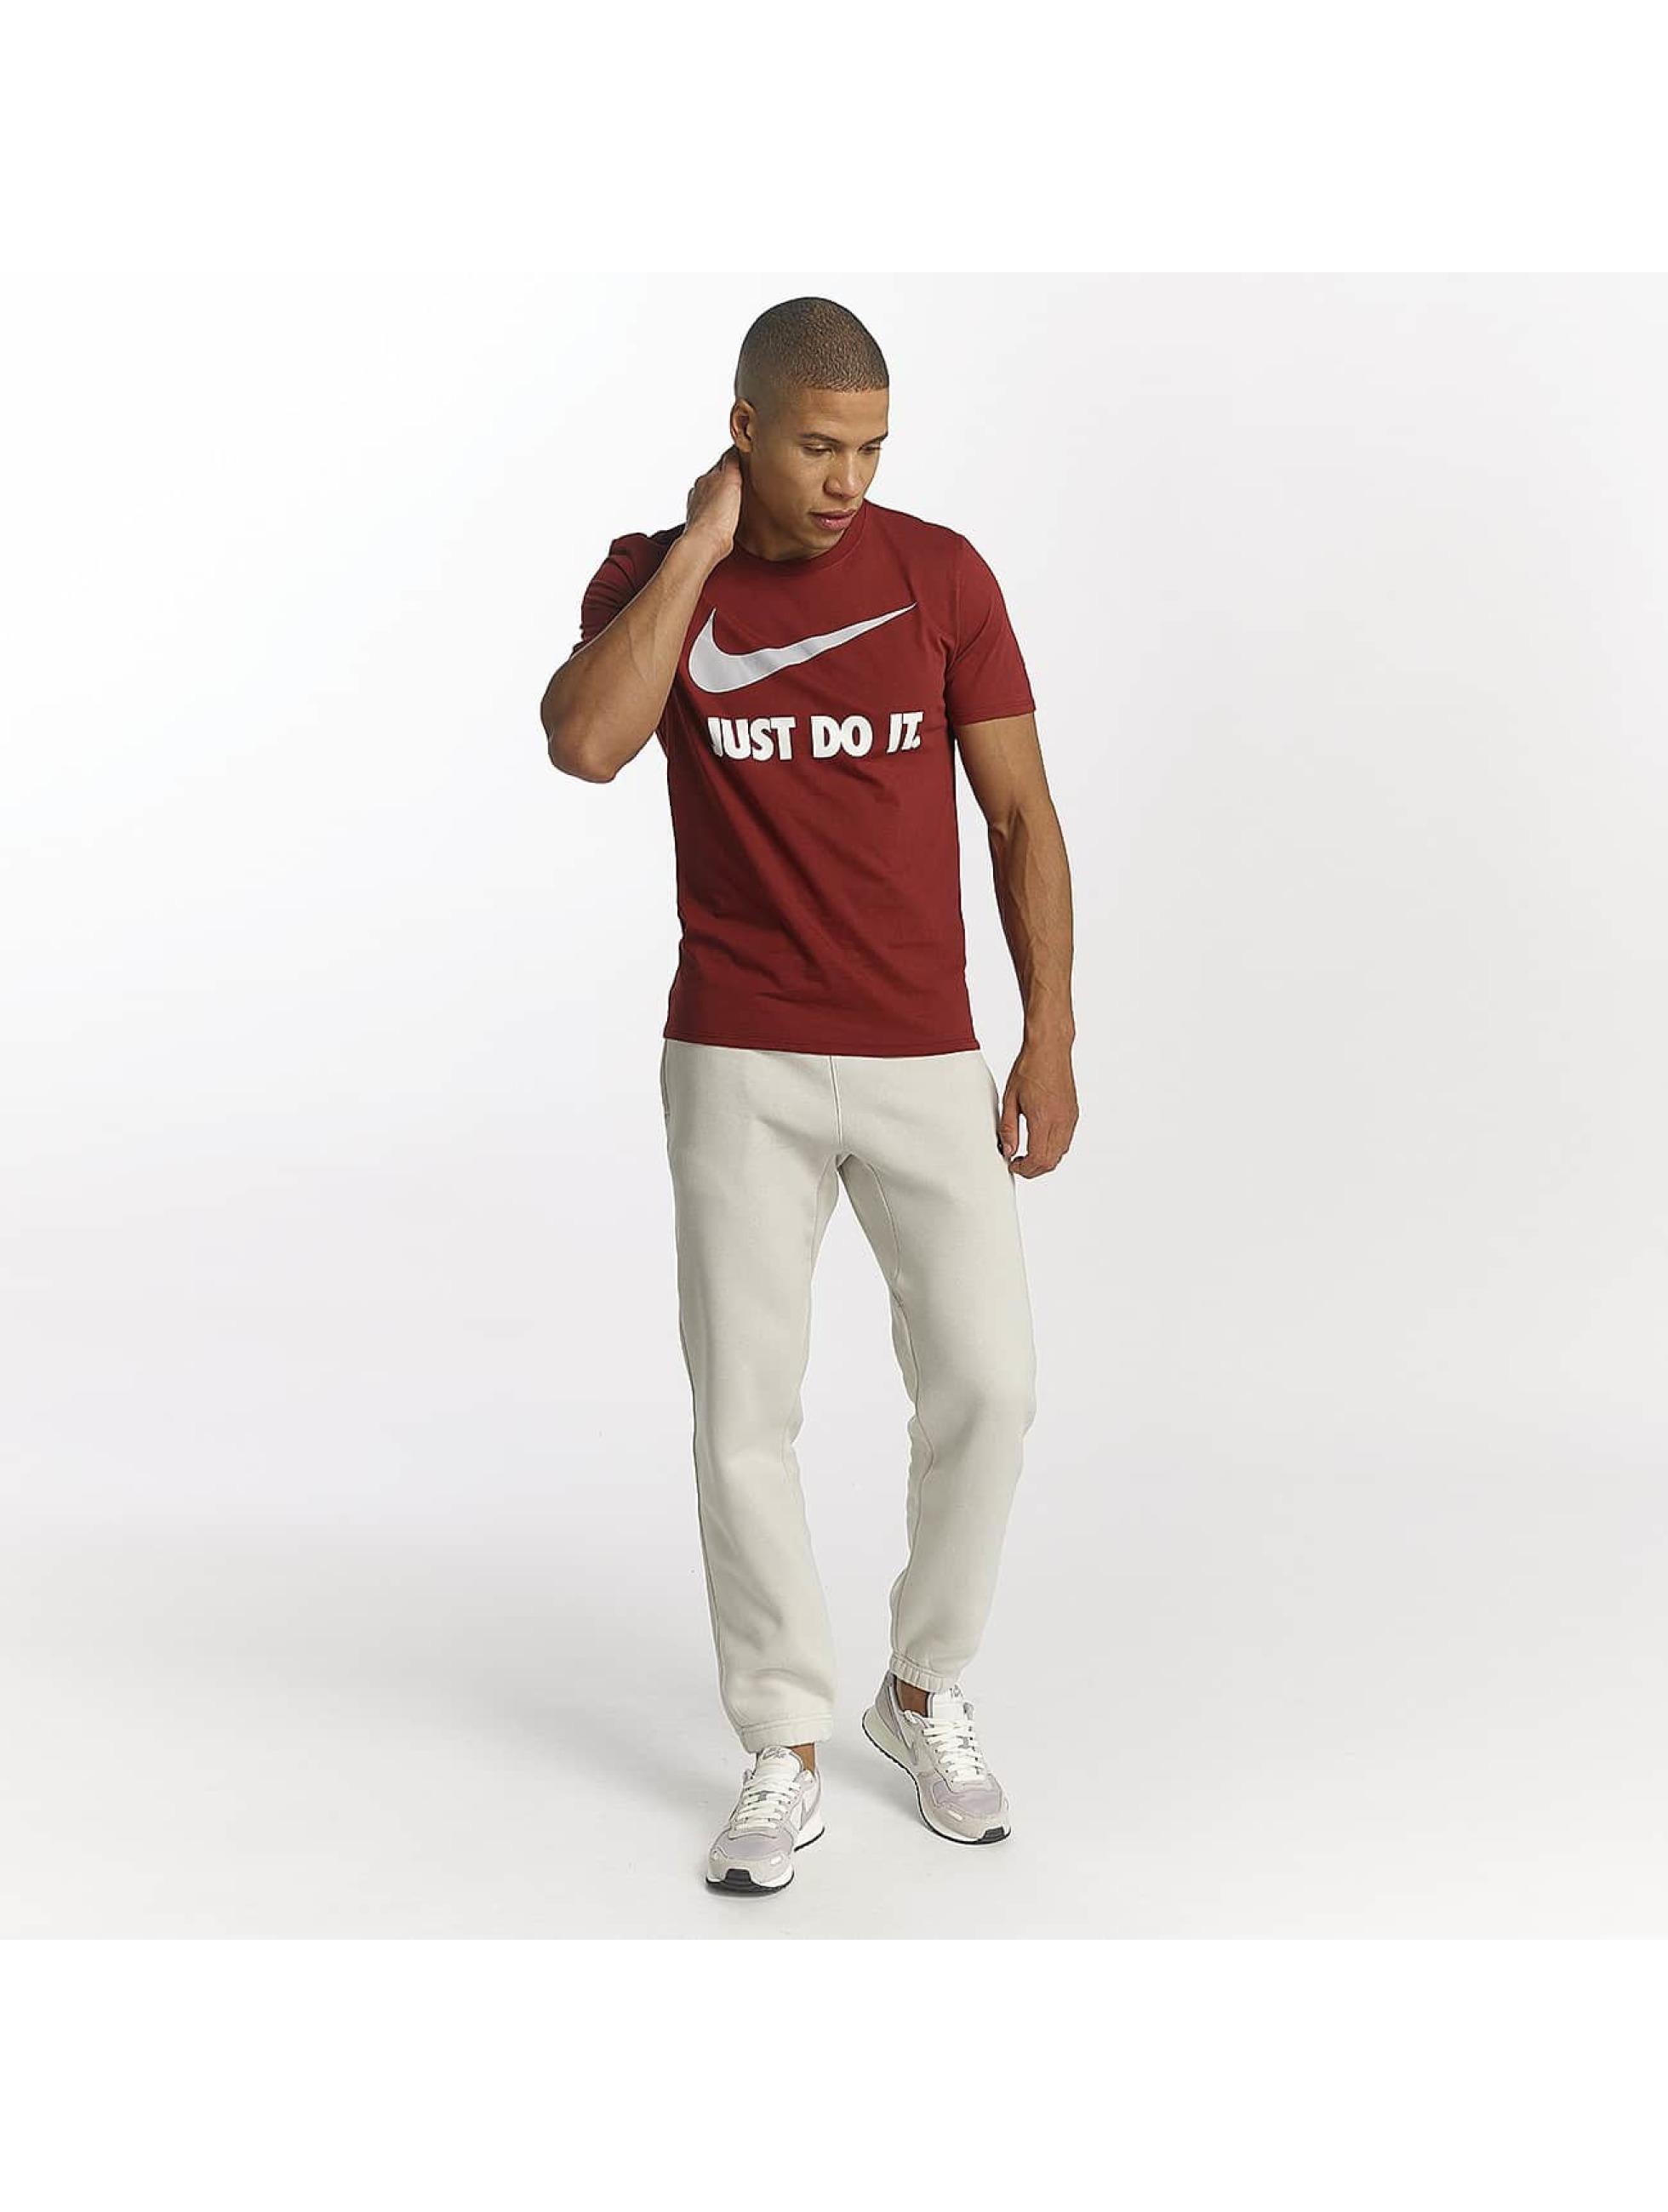 Nike t-shirt New JDI rood